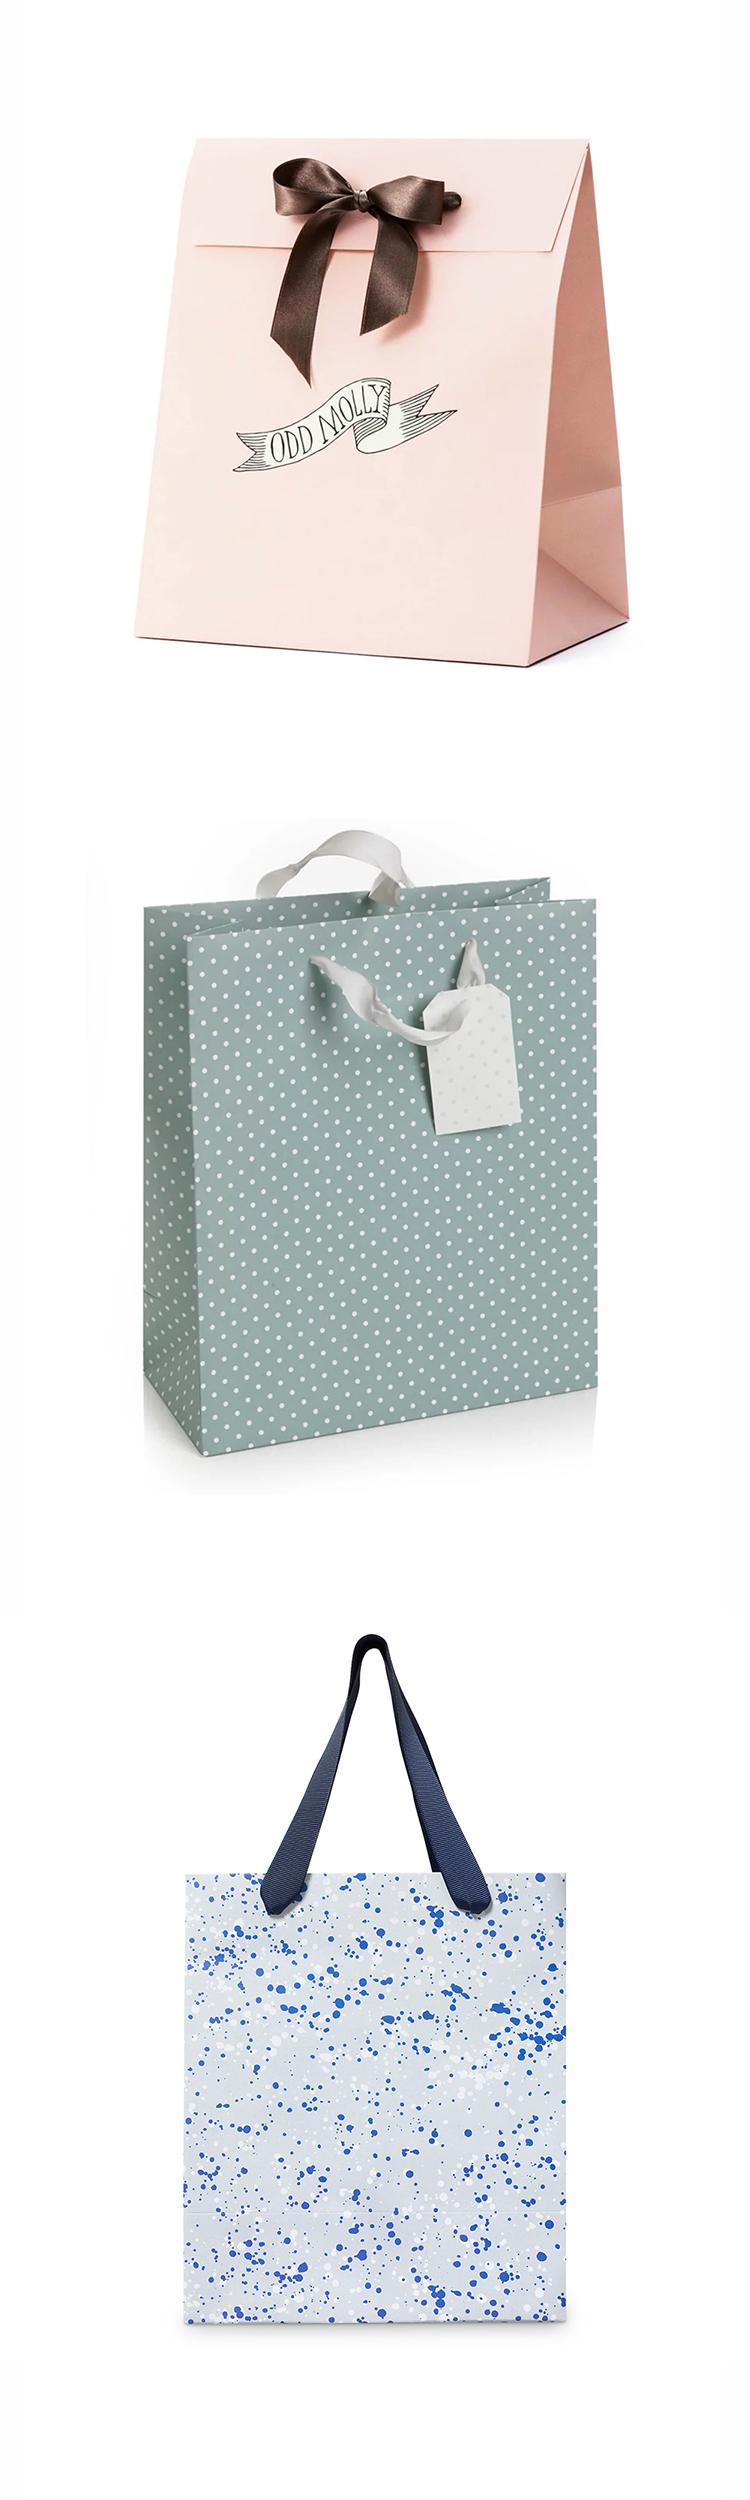 paper bag logo